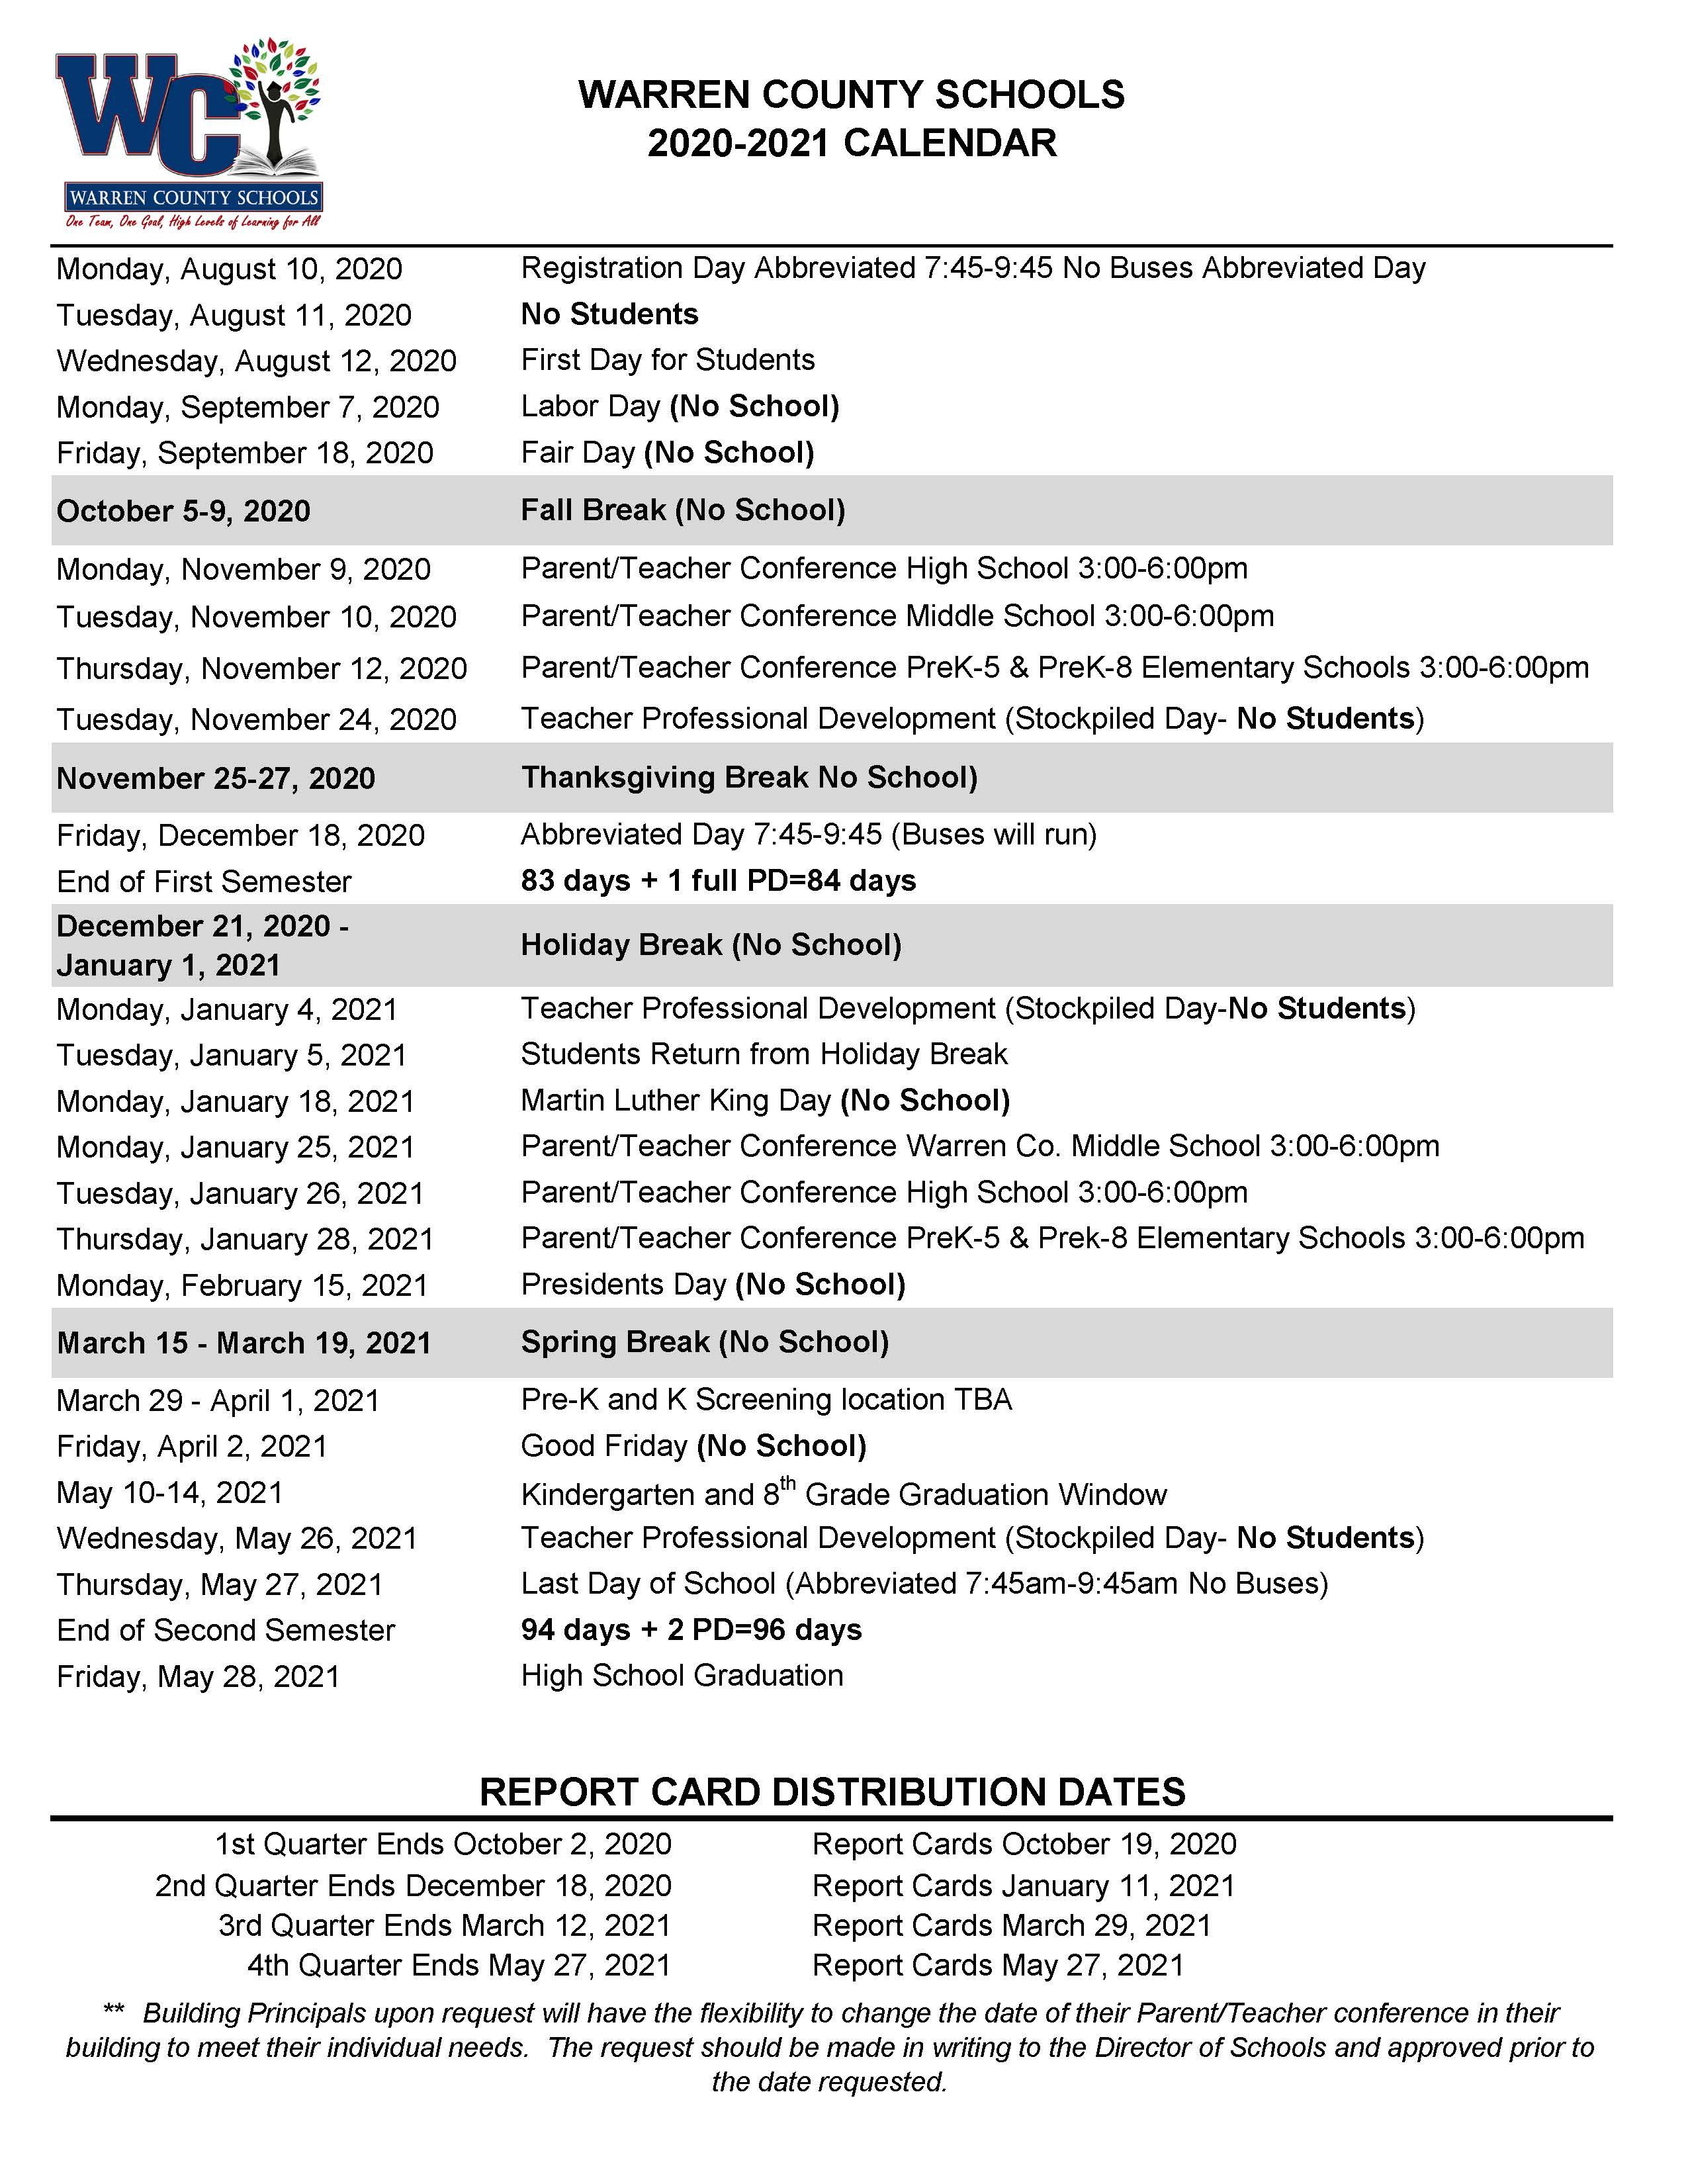 Home – Warren County Schools Throughout Durham Public Schools 2021 Calendar